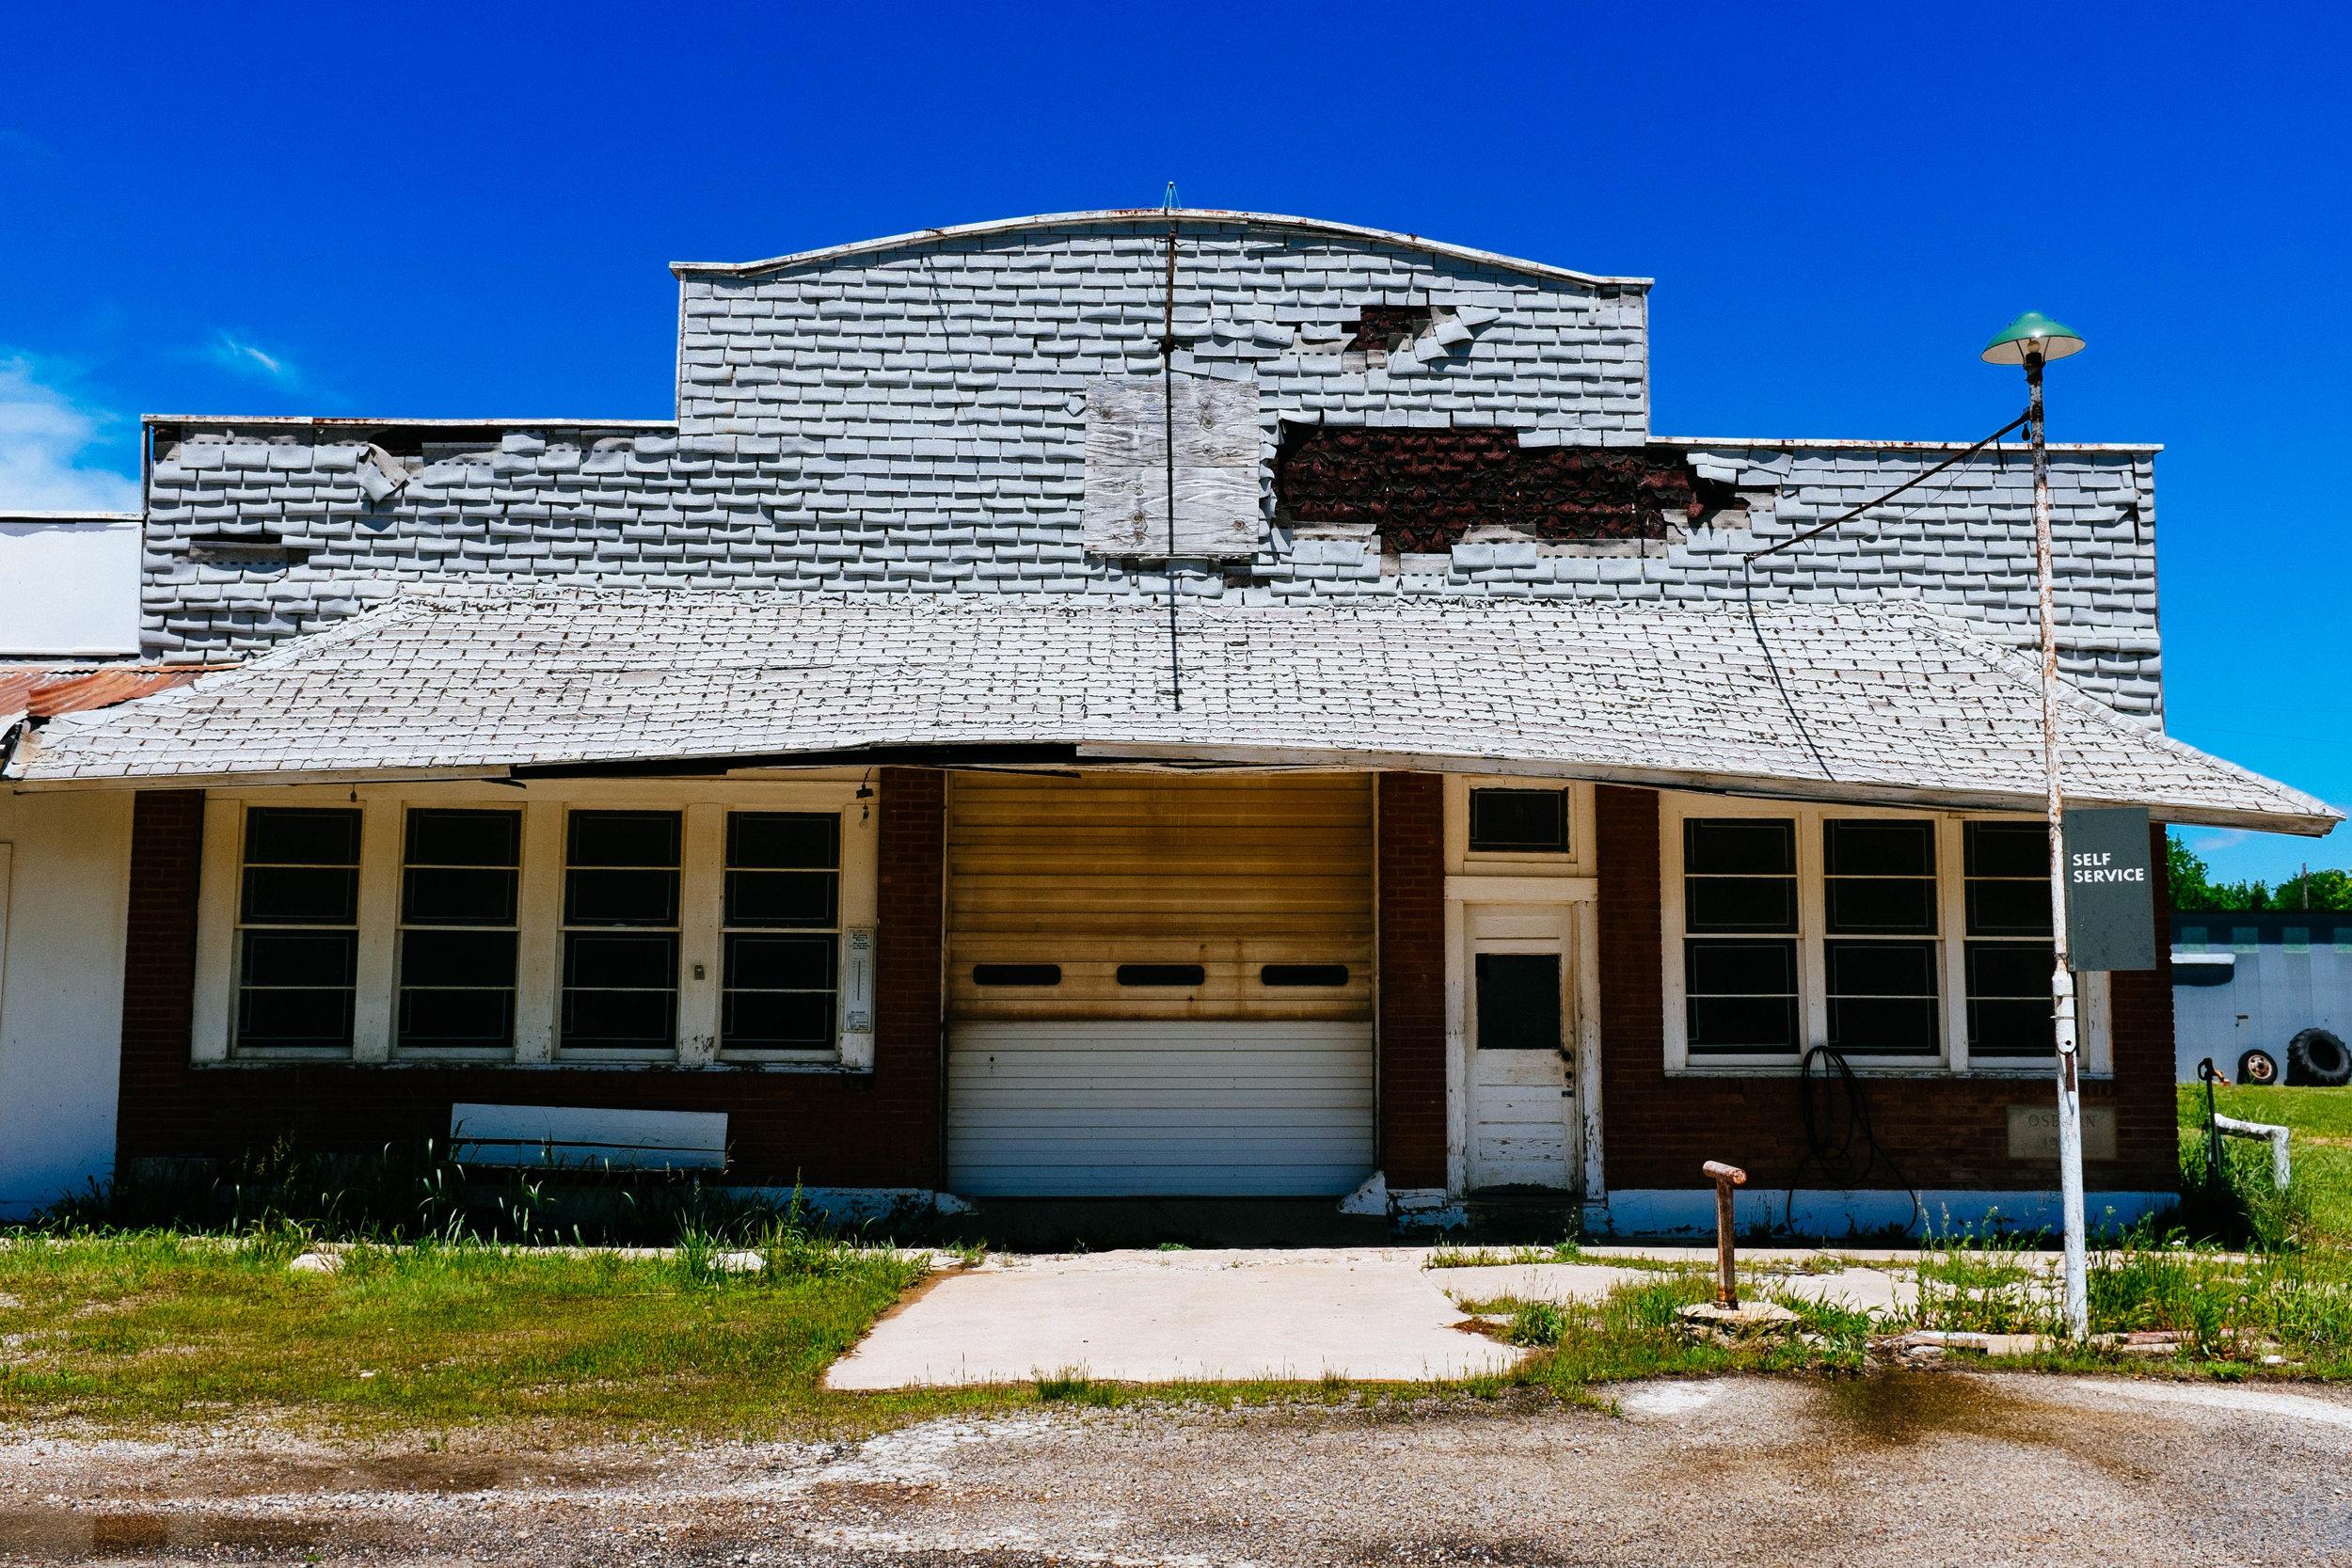 Beaumont-Howard-Elk Falls_05-17-15-51.jpg